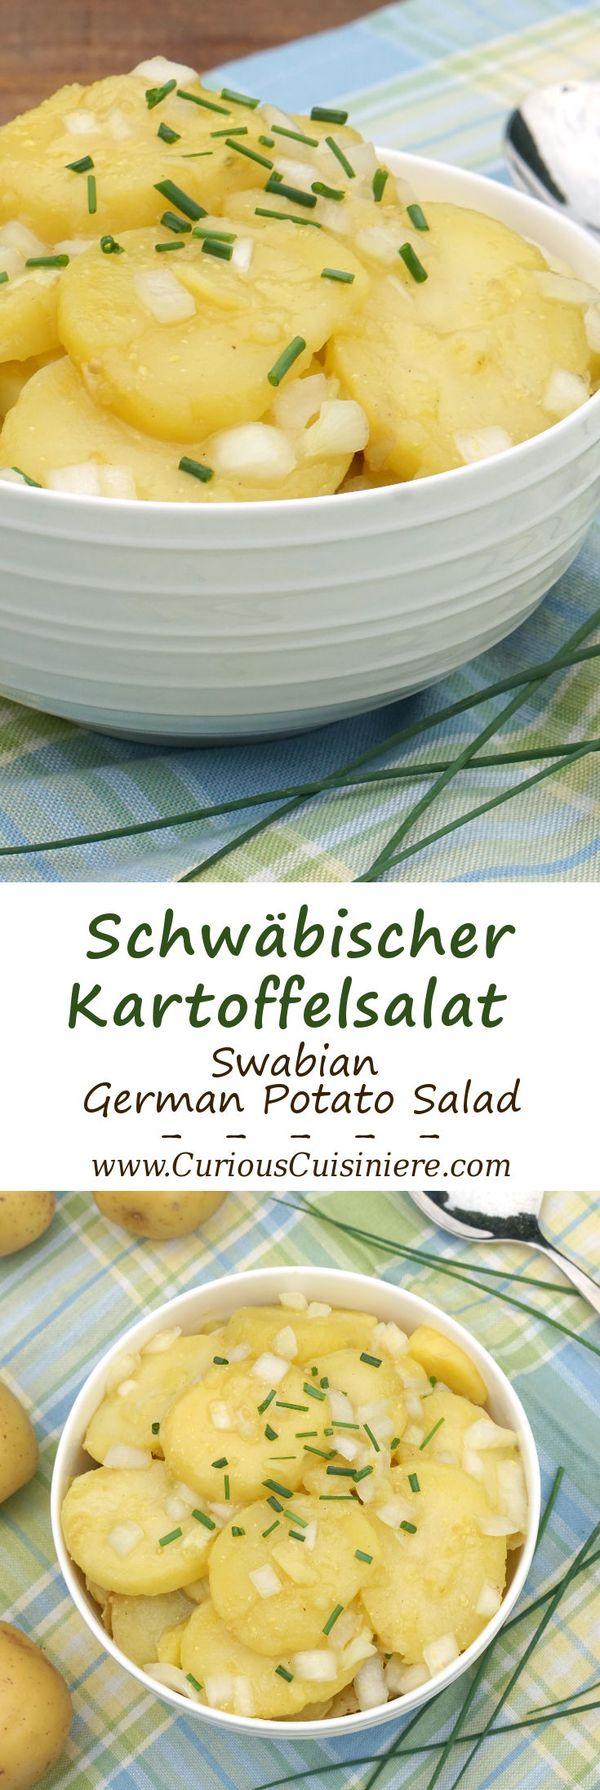 Schwabischer Kartoffelsalat (Swabian Potato Salad